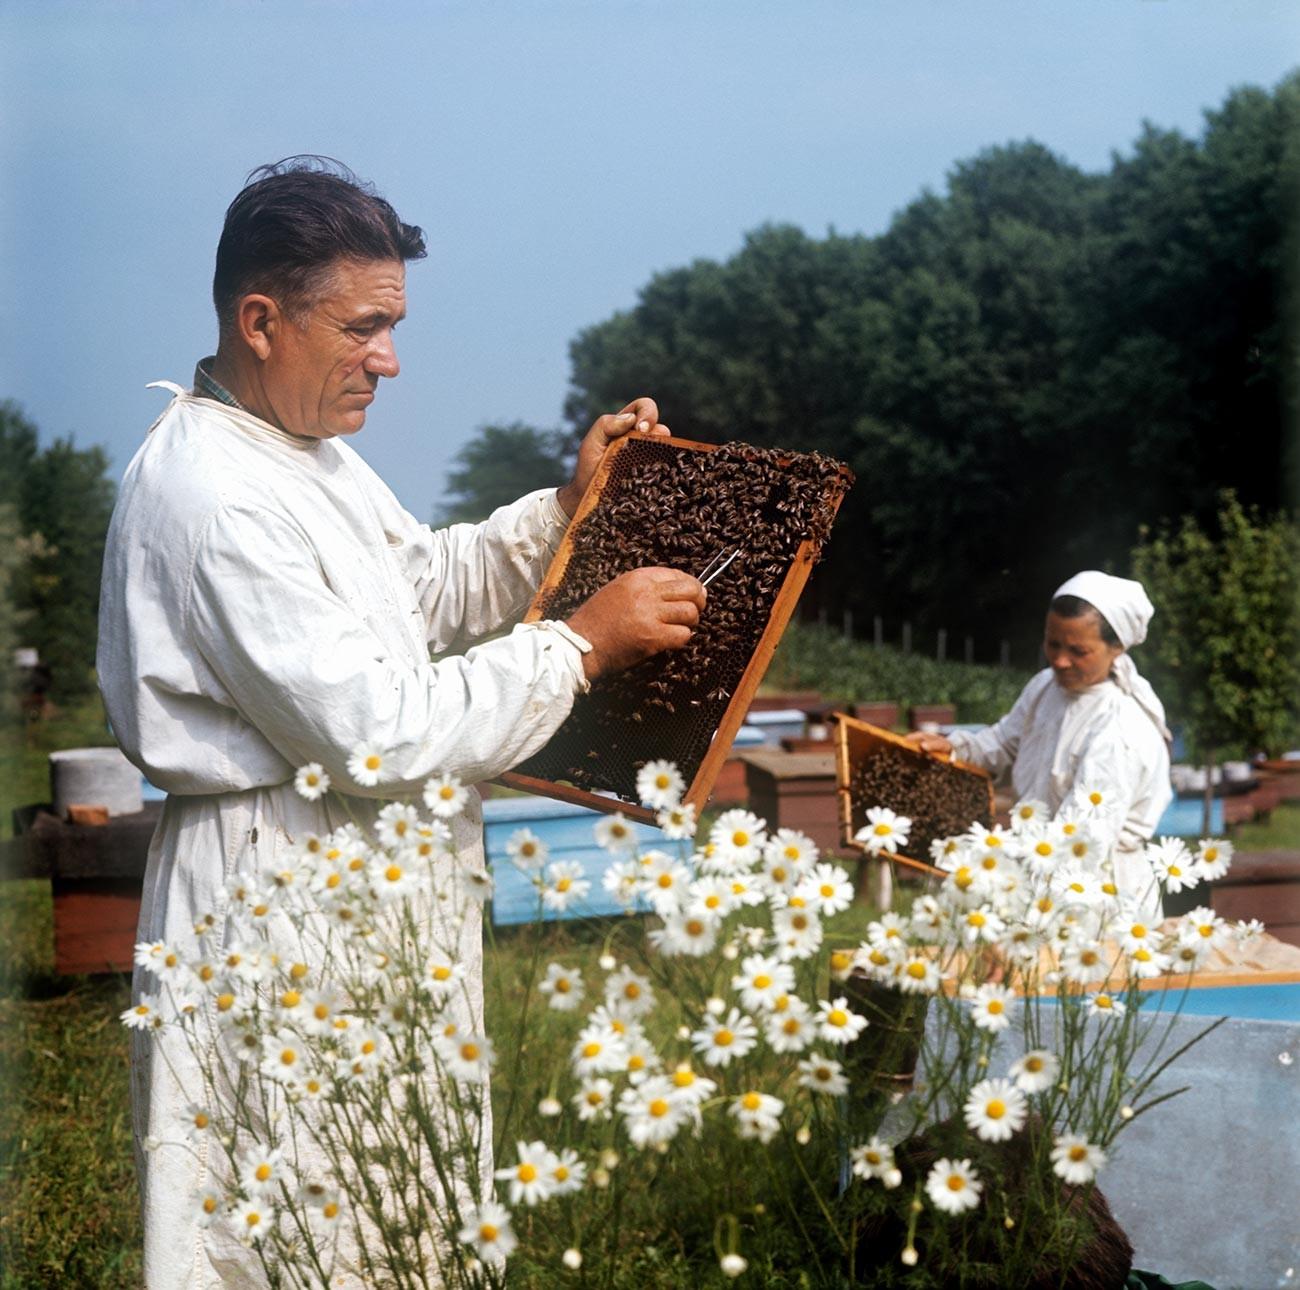 Peternak lebah Anton Lupulchuk di sebuah peternakan lebah di pertanian kolektif Mayak, distrik Dondyushansky, 1975.